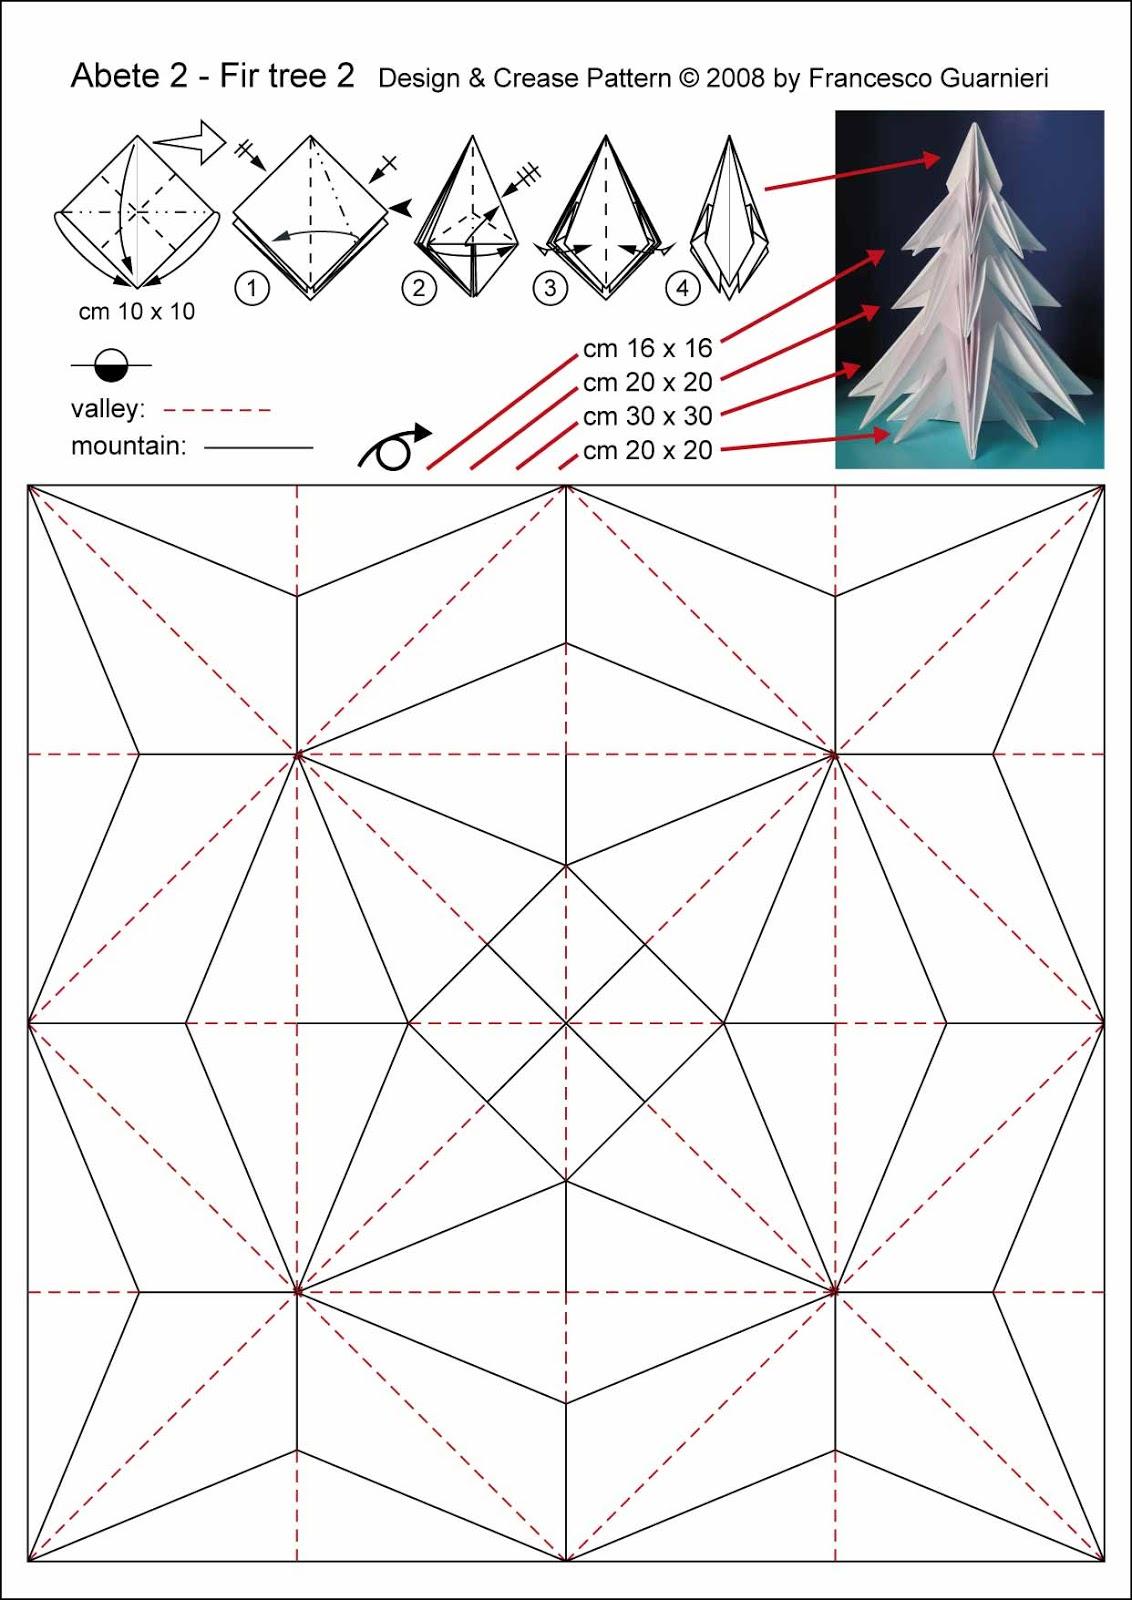 Origami diagrammi-CP Abete 2 - Fir tree 2 by Francesco Guarnieri.